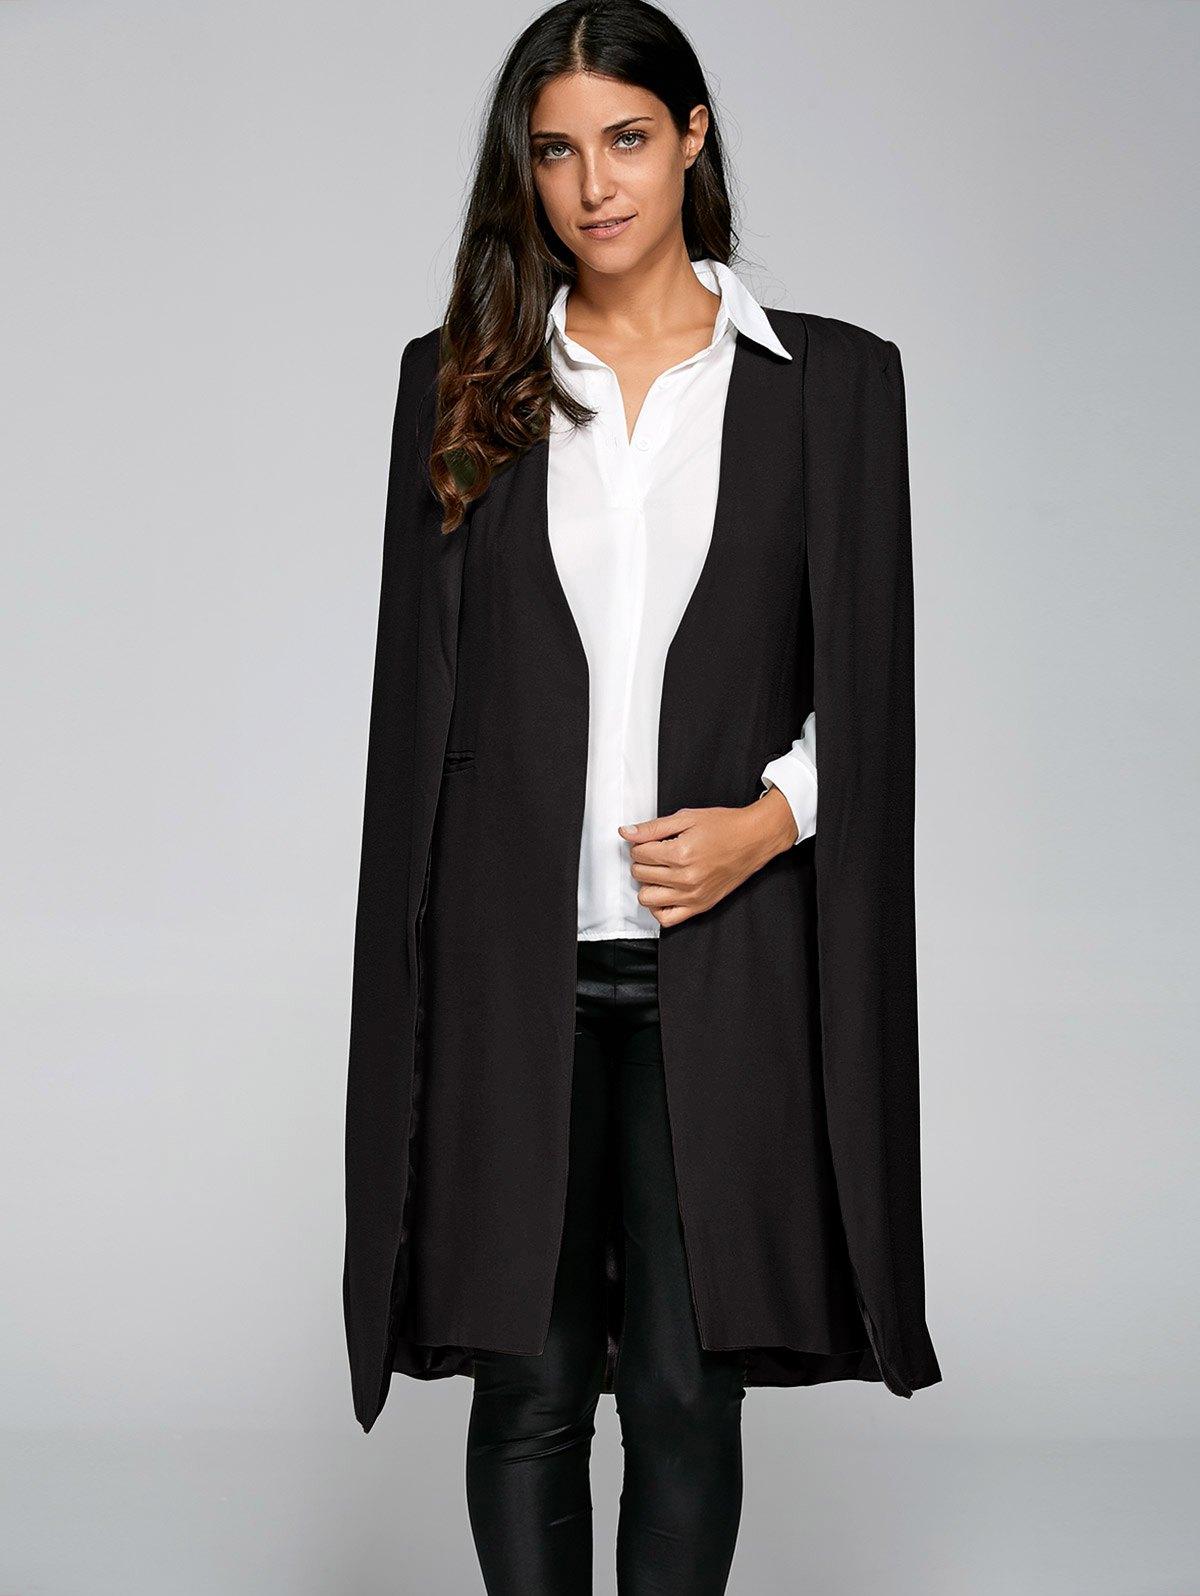 Loose Cape Cloak Overcoat 194963716